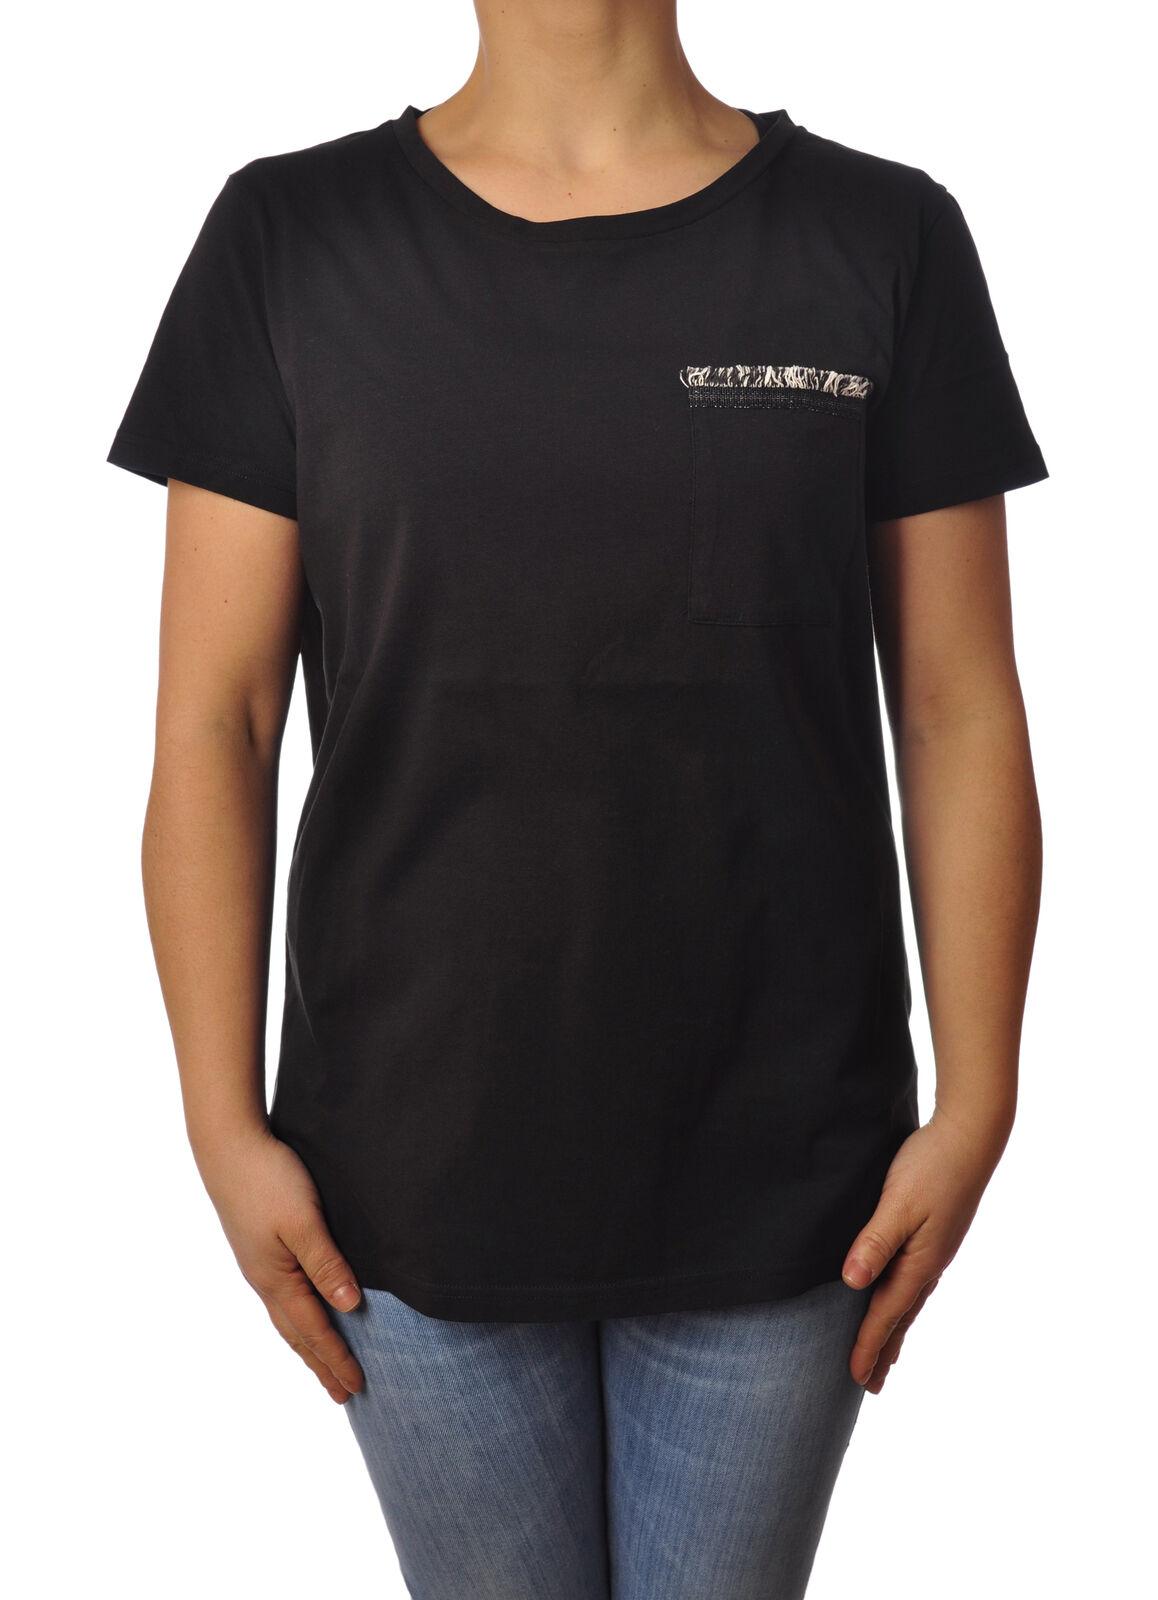 Woolrich - Topwear-T-shirts - Frau - noir - 4984210H184133